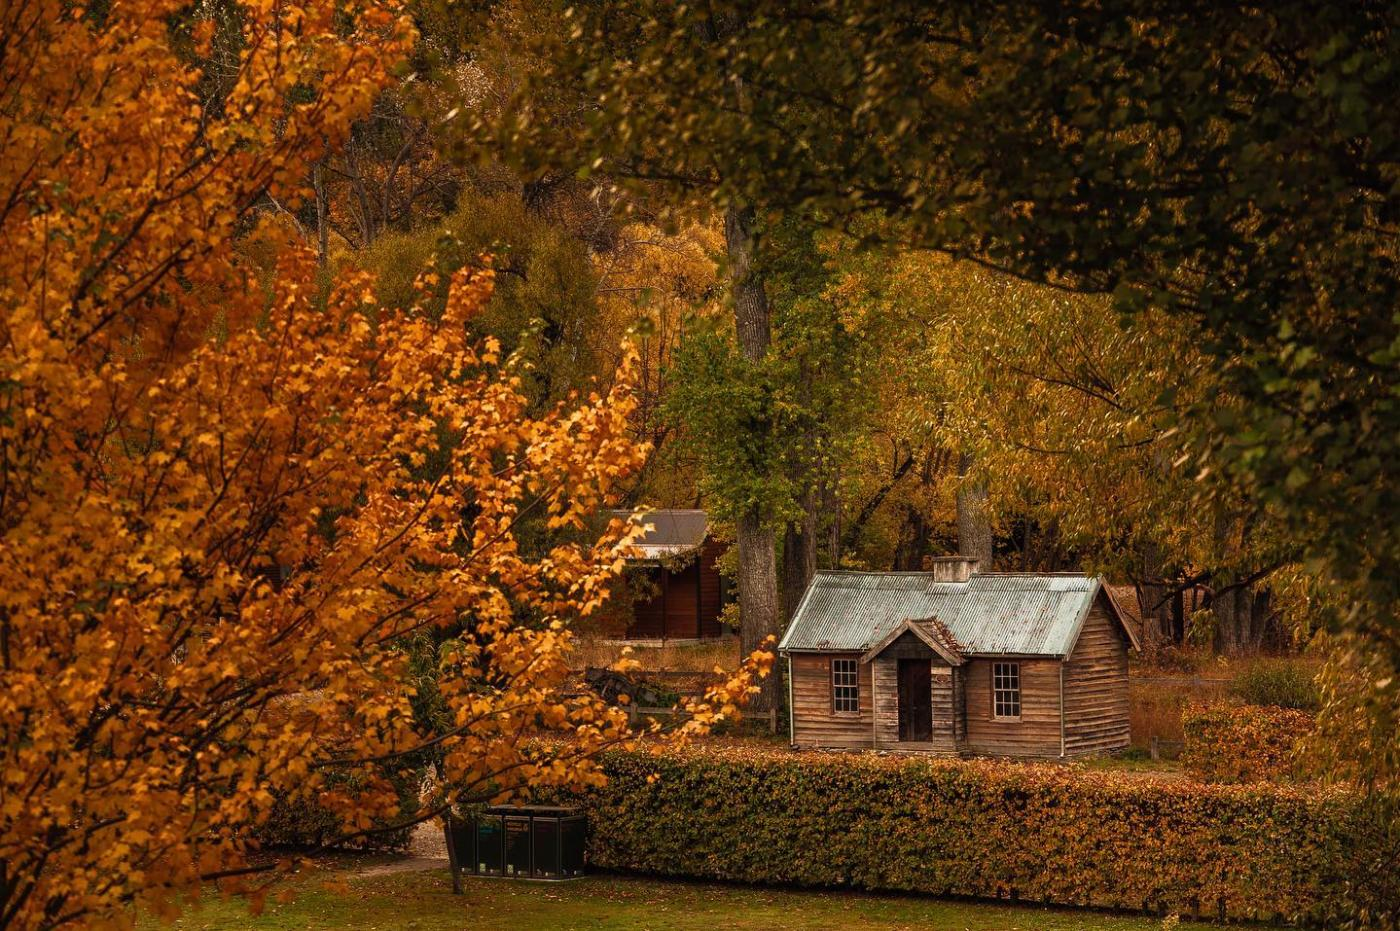 Police camp hut in autumn, Arrowtown